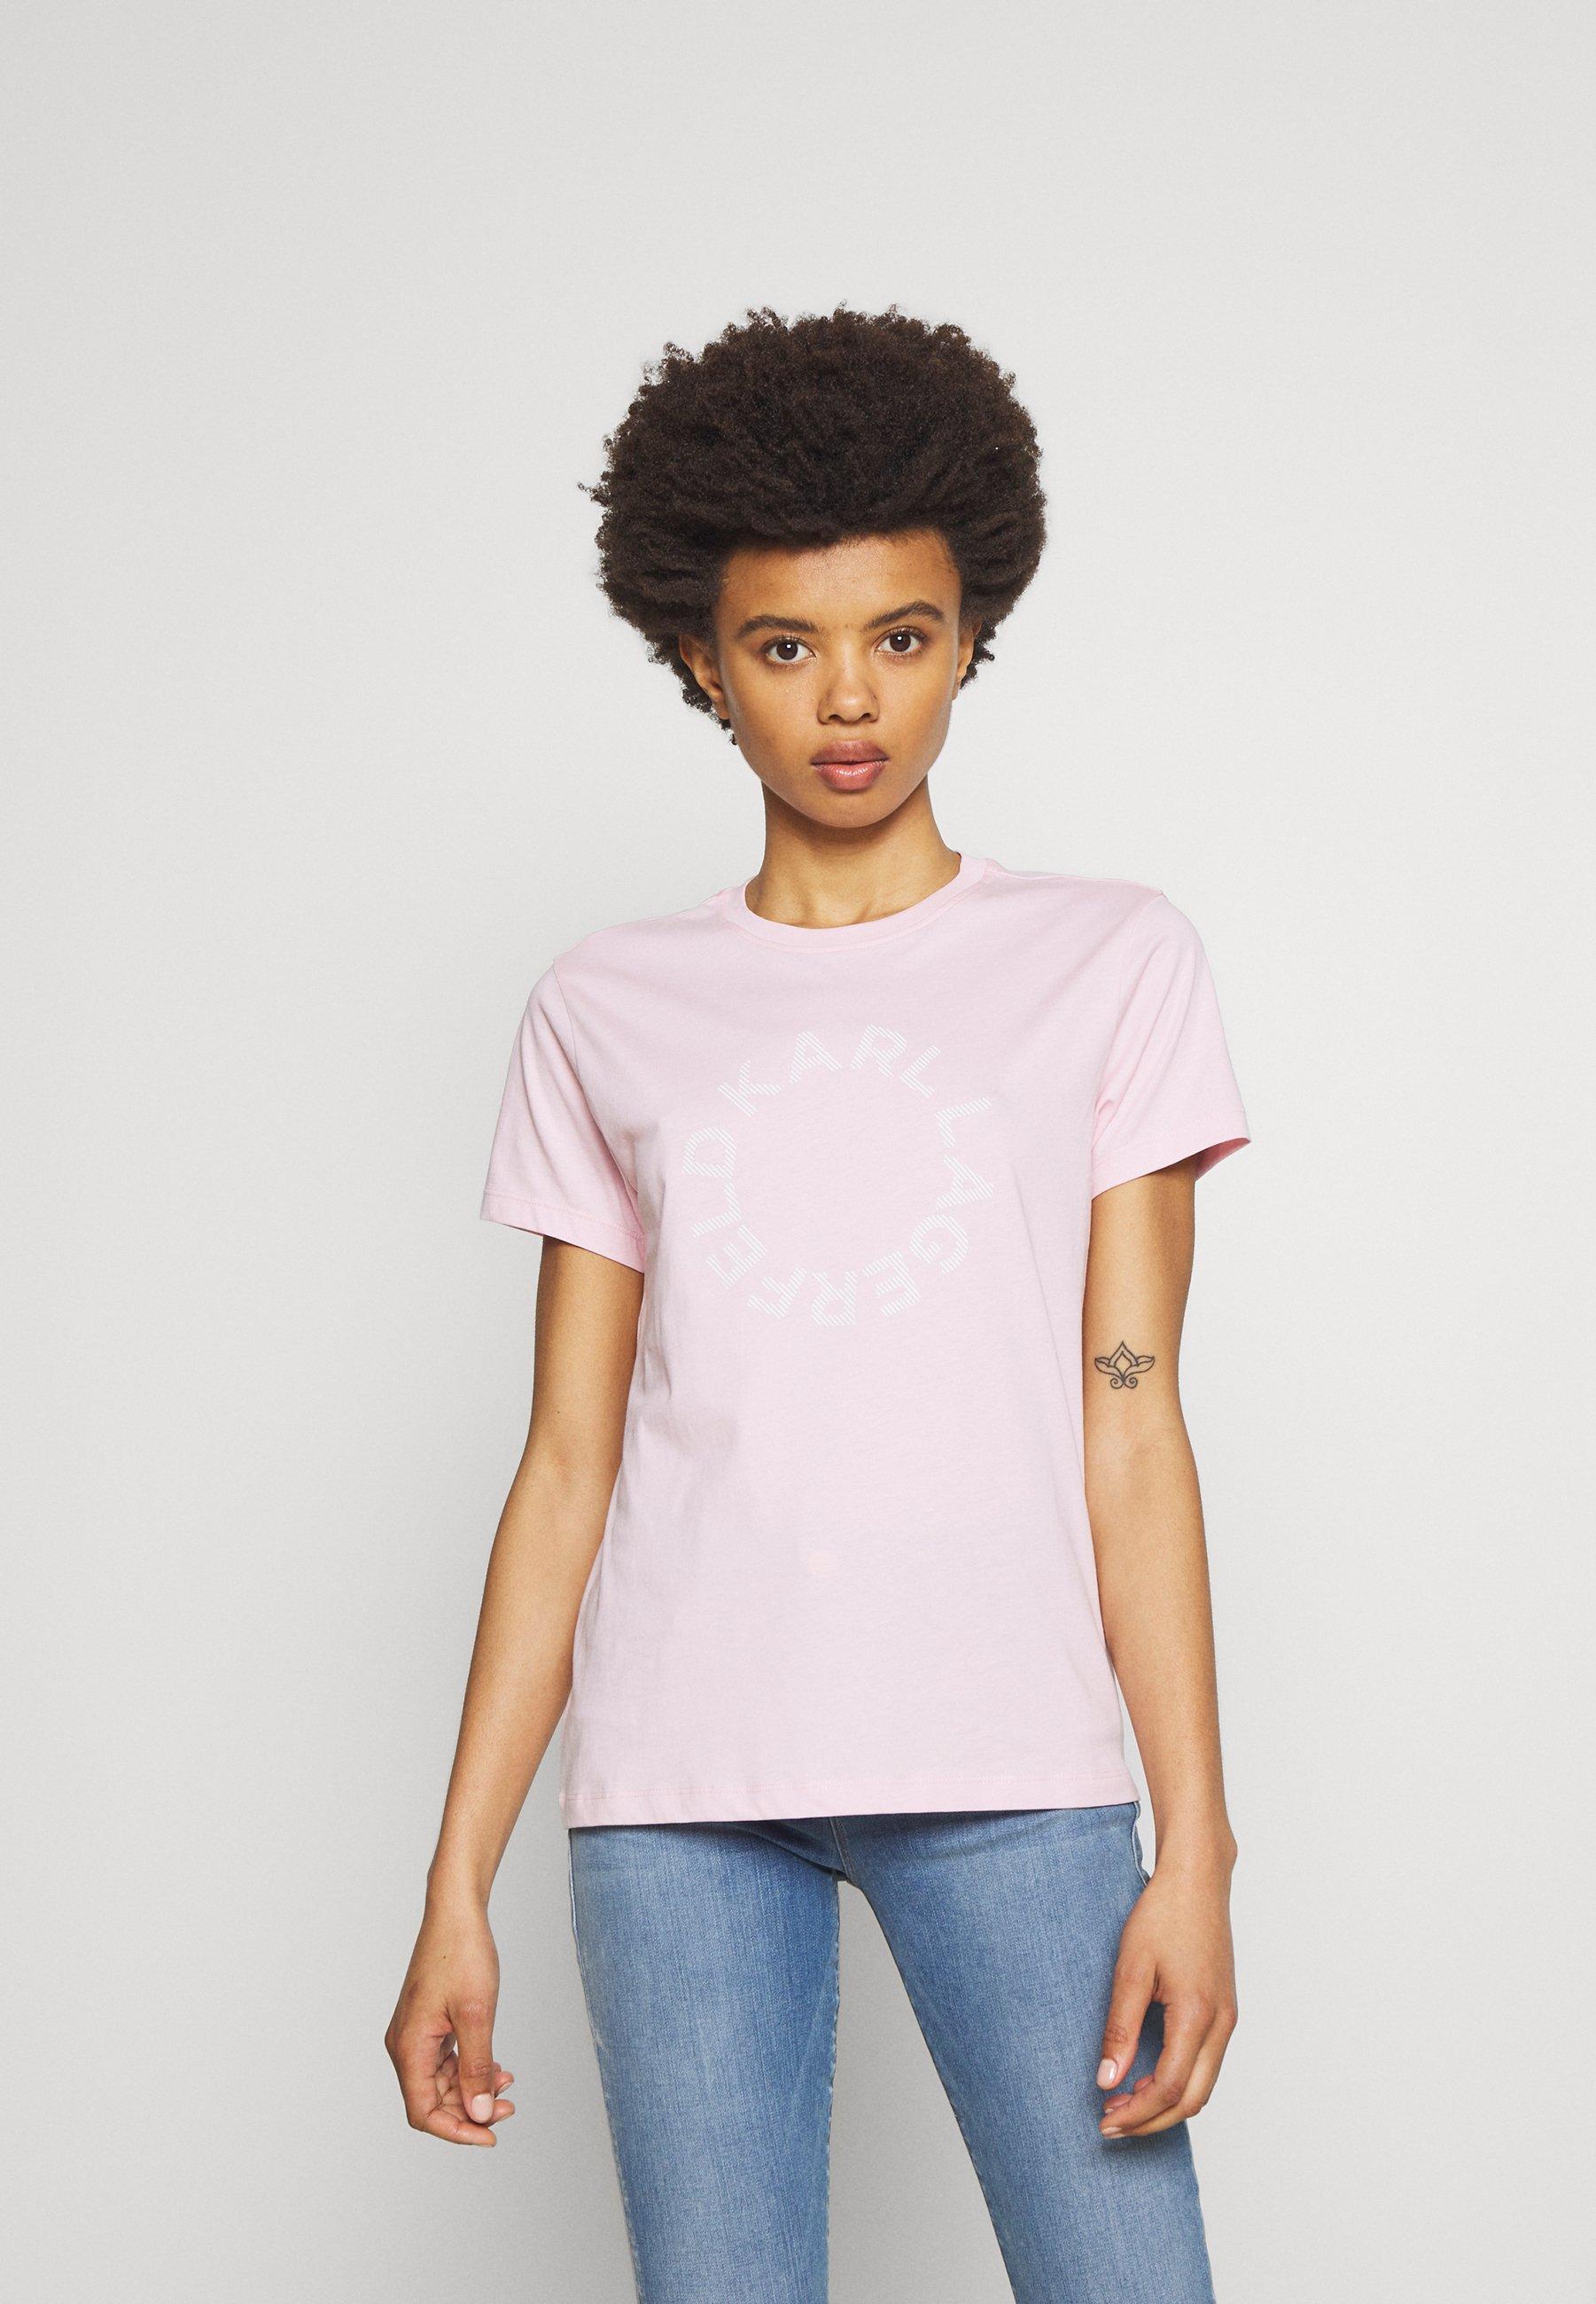 Shop Women's Clothing KARL LAGERFELD CIRCLE LOGO Print T-shirt pink hCJIkOpu4